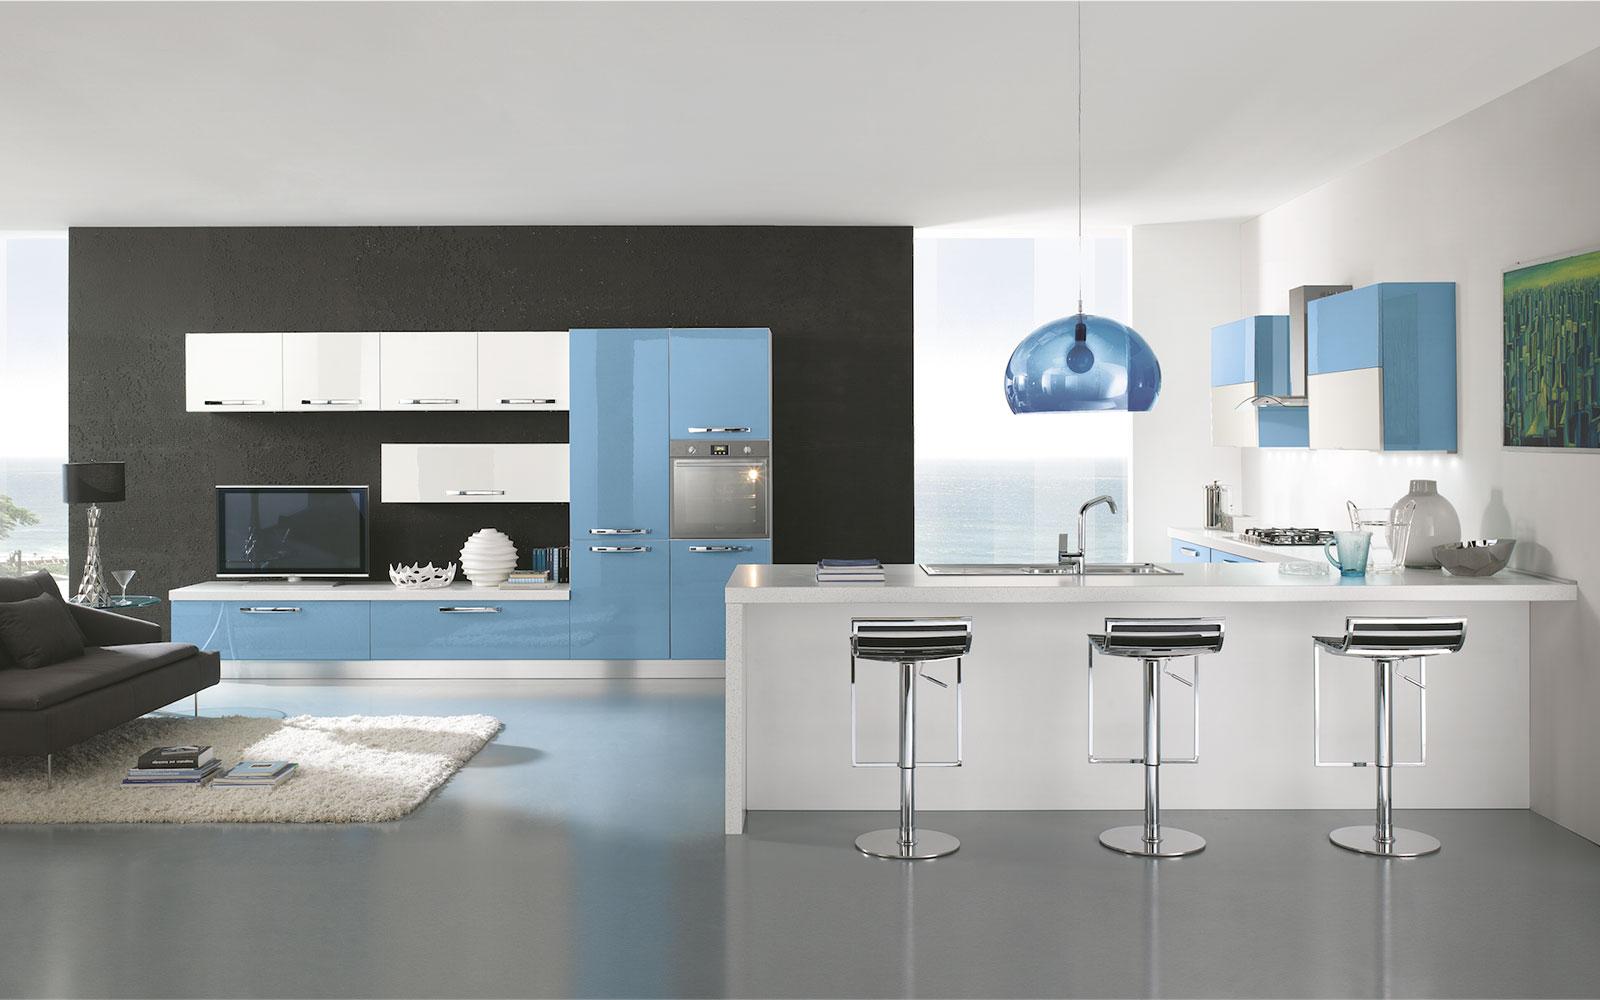 08-cucina-moderna-gaia-bianco_blu-pastello.jpg